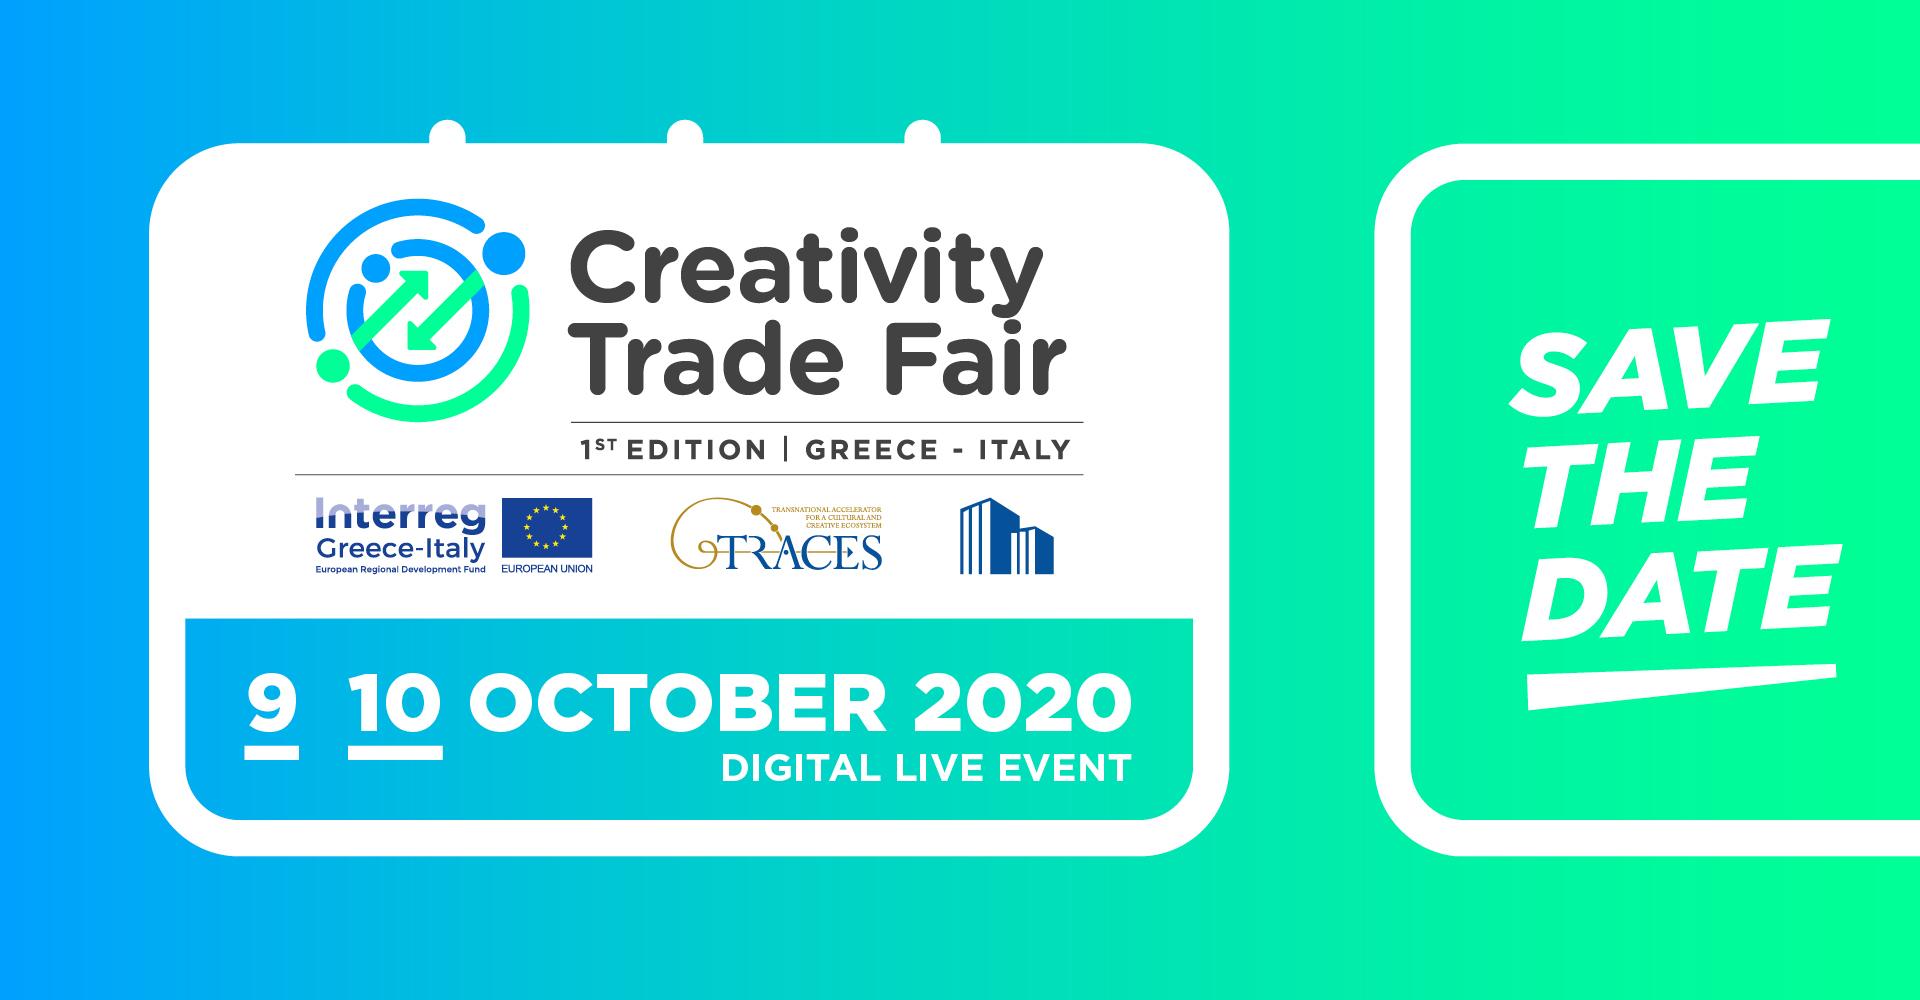 Save-the-date_Creativity_Trade_Fair